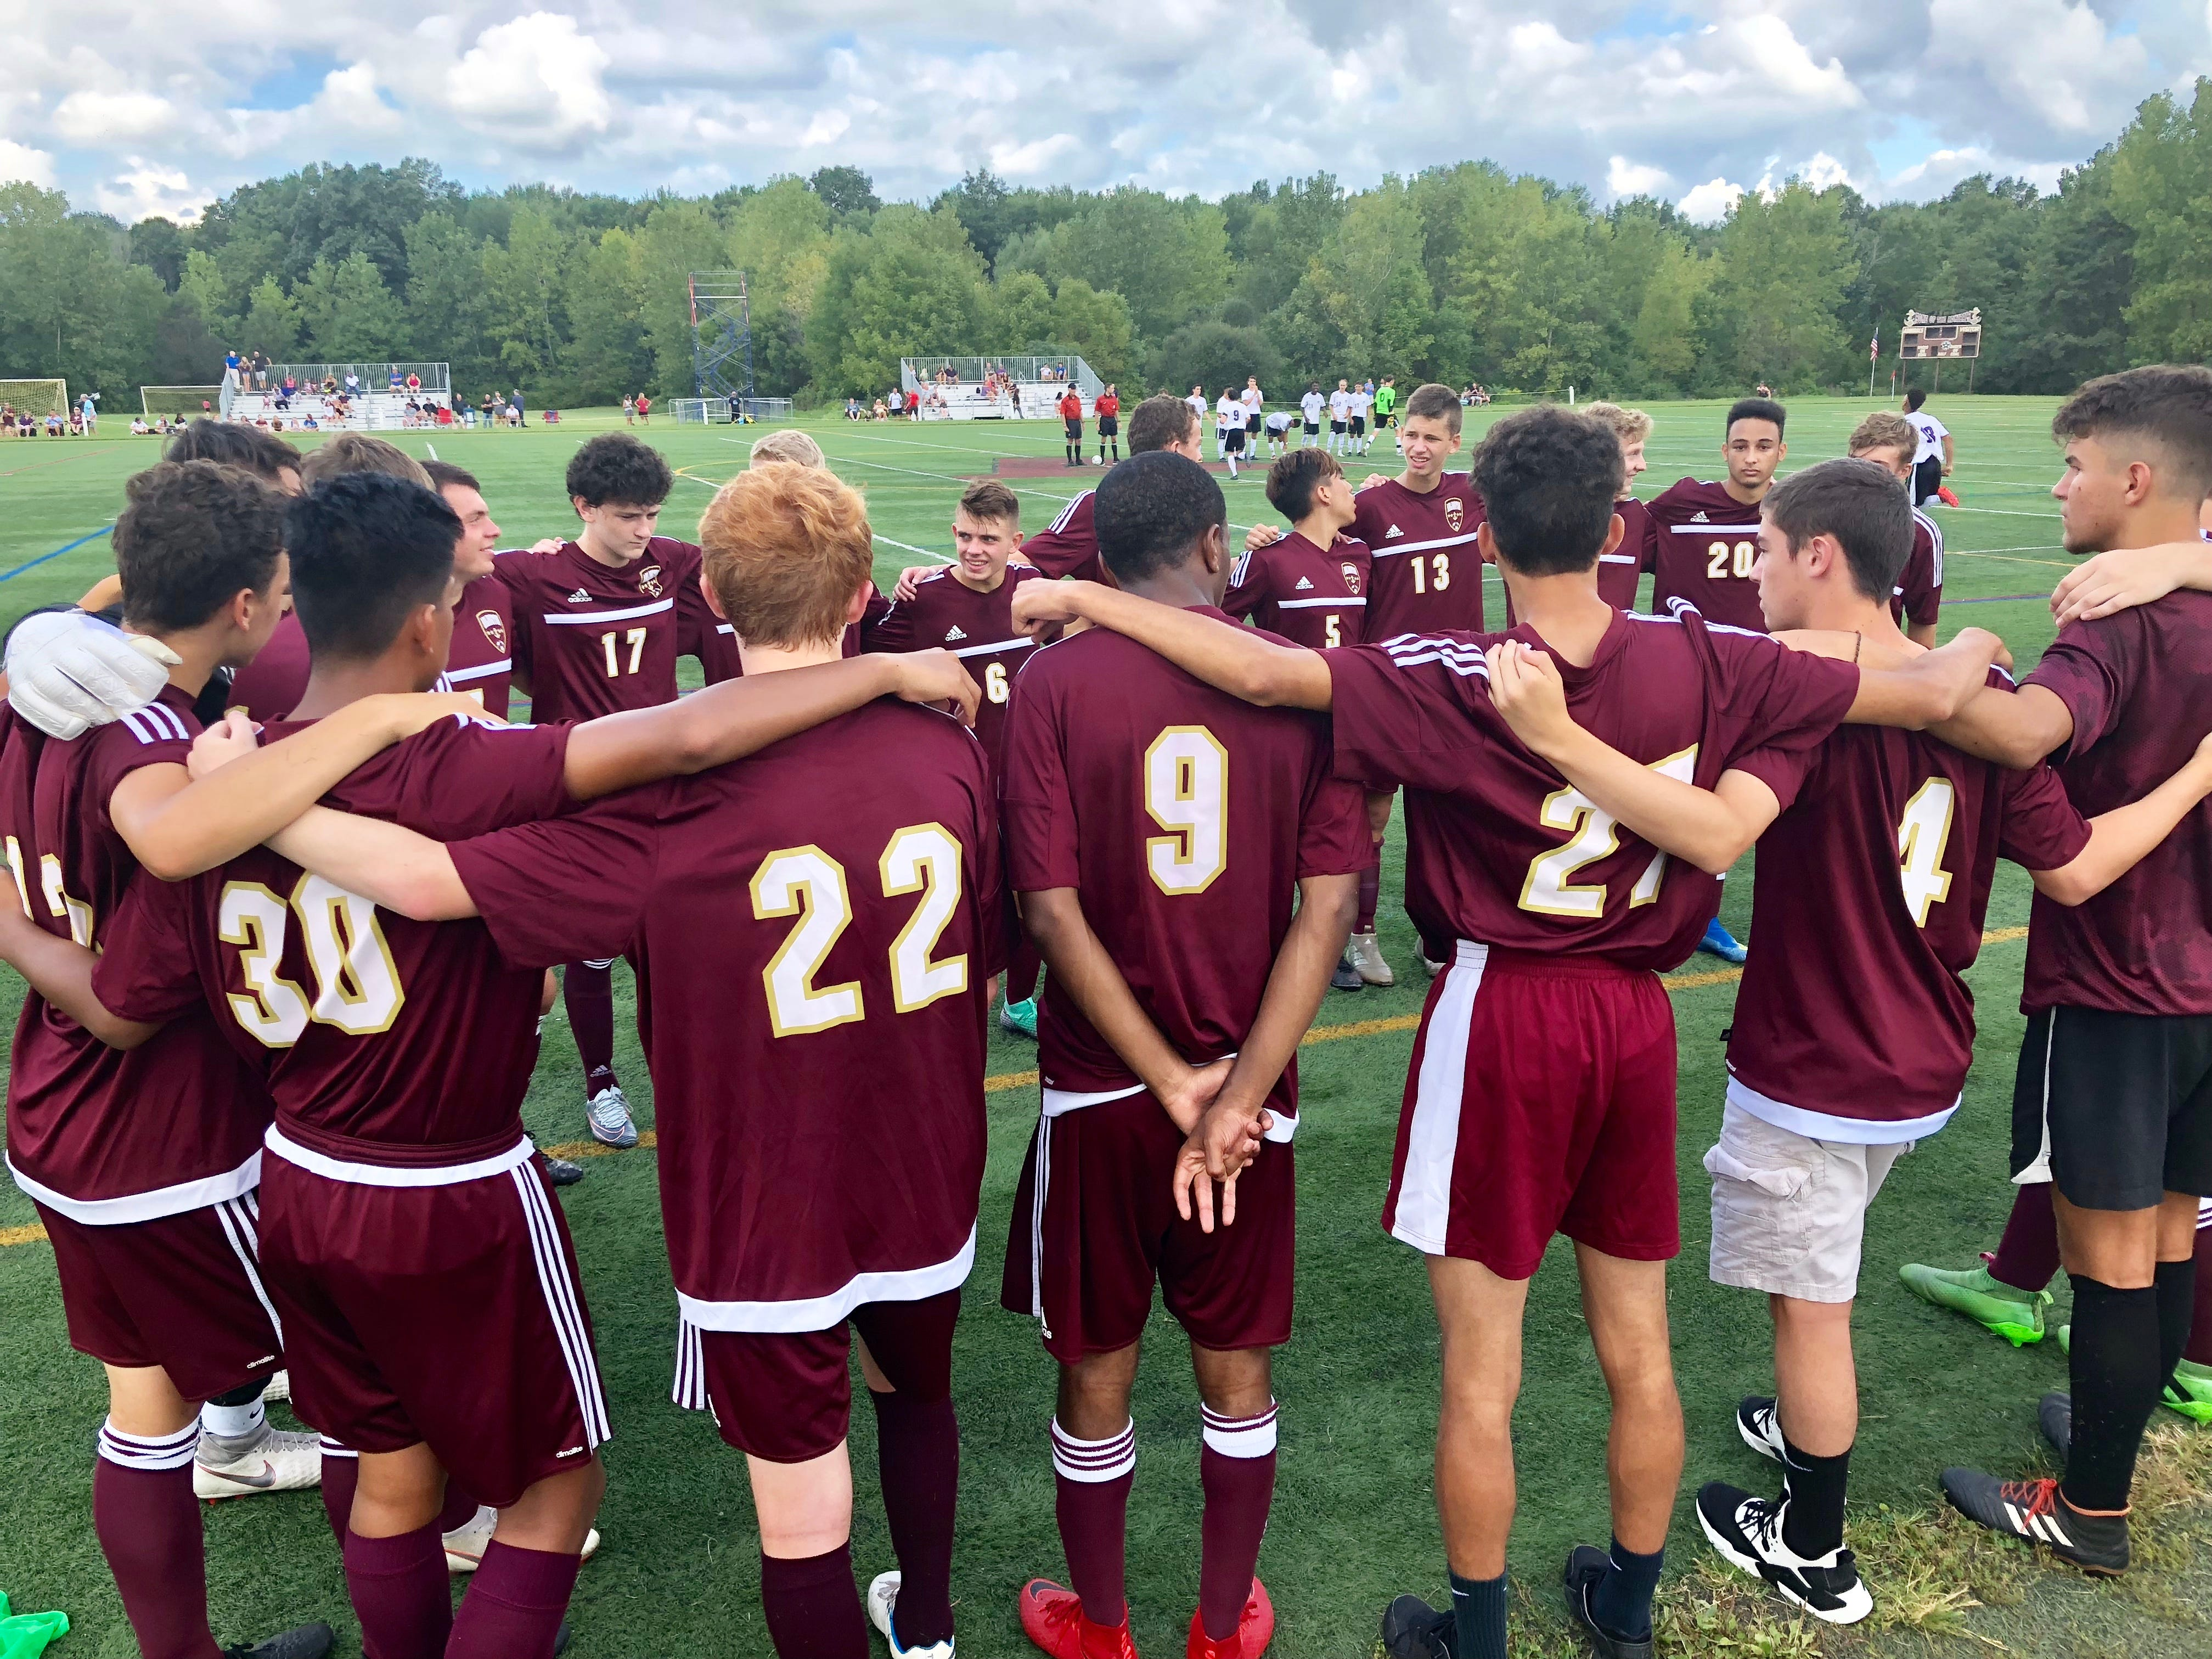 The Arlington High School boys soccer team huddles before its match on Thursday against Monroe-Woodbury.